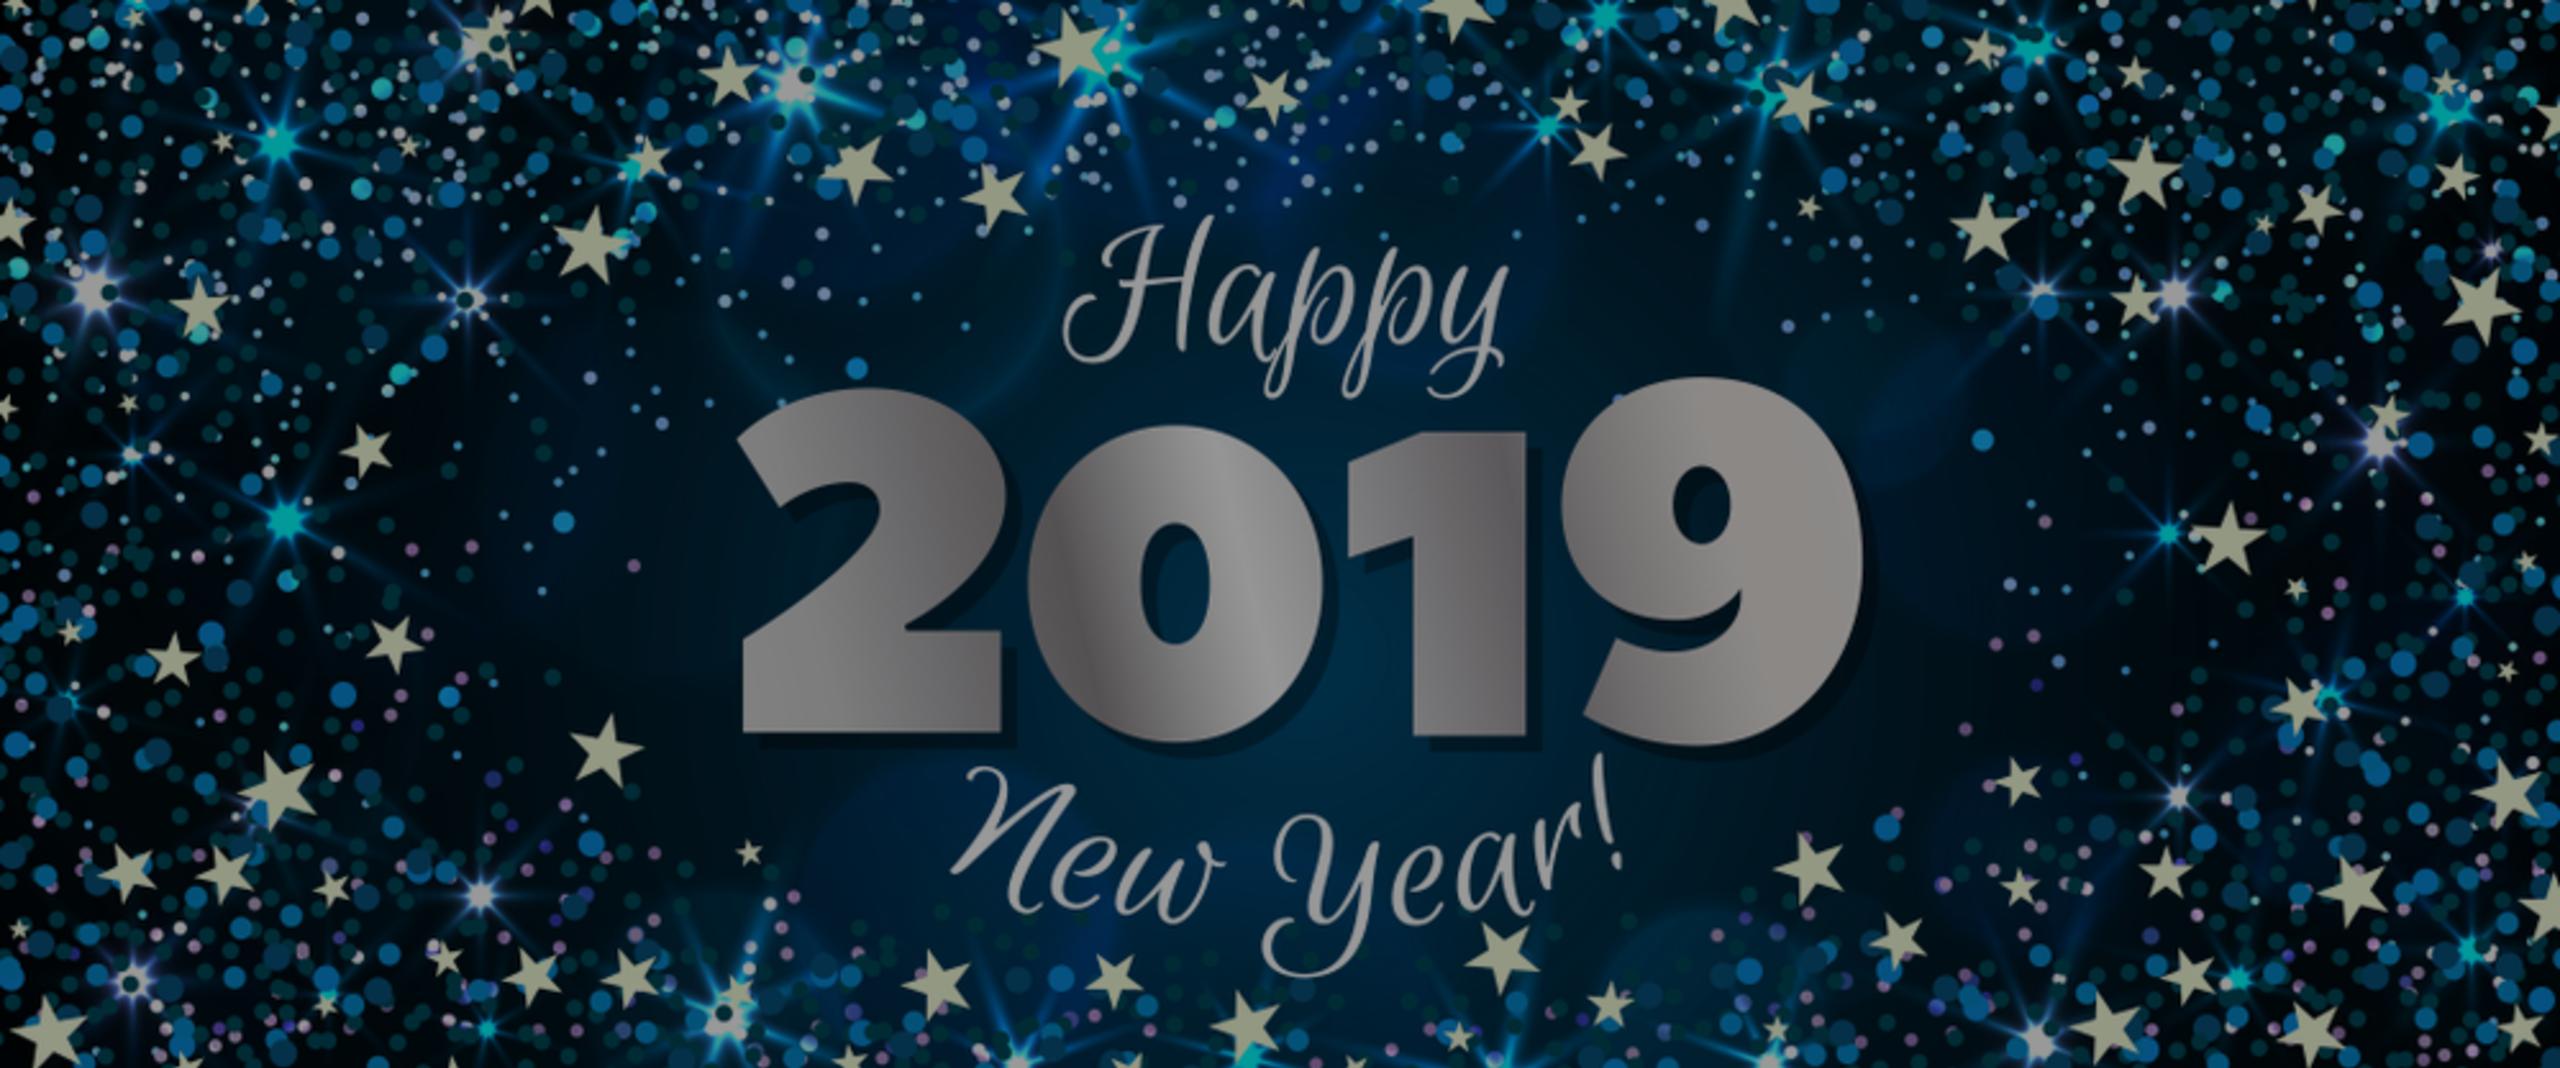 Happy New Year From The Tammy Mrotek Team!